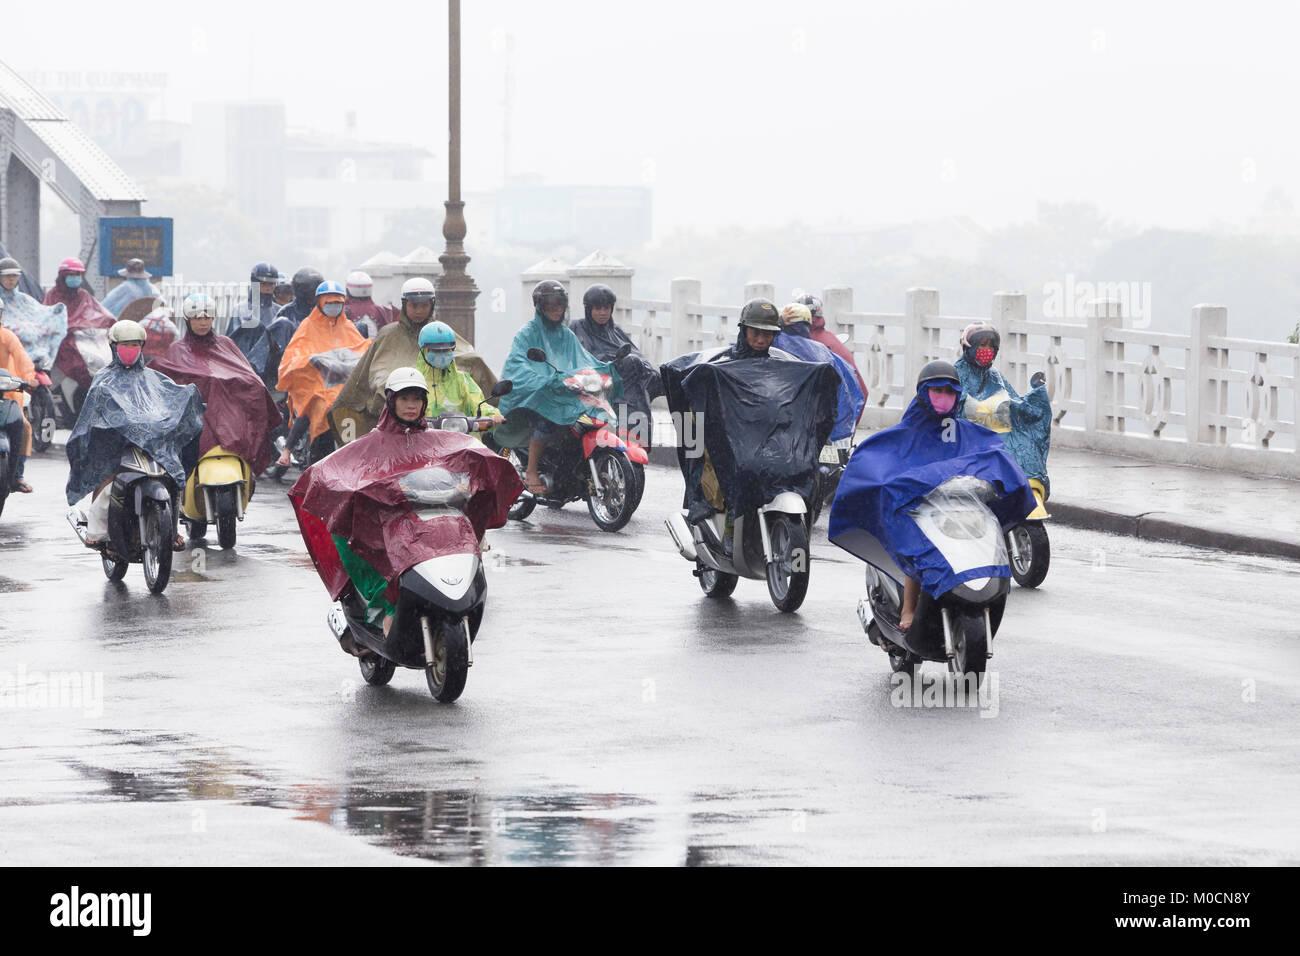 Traffic on the Trang Tien bridge in Hue, Vietnam - Stock Image